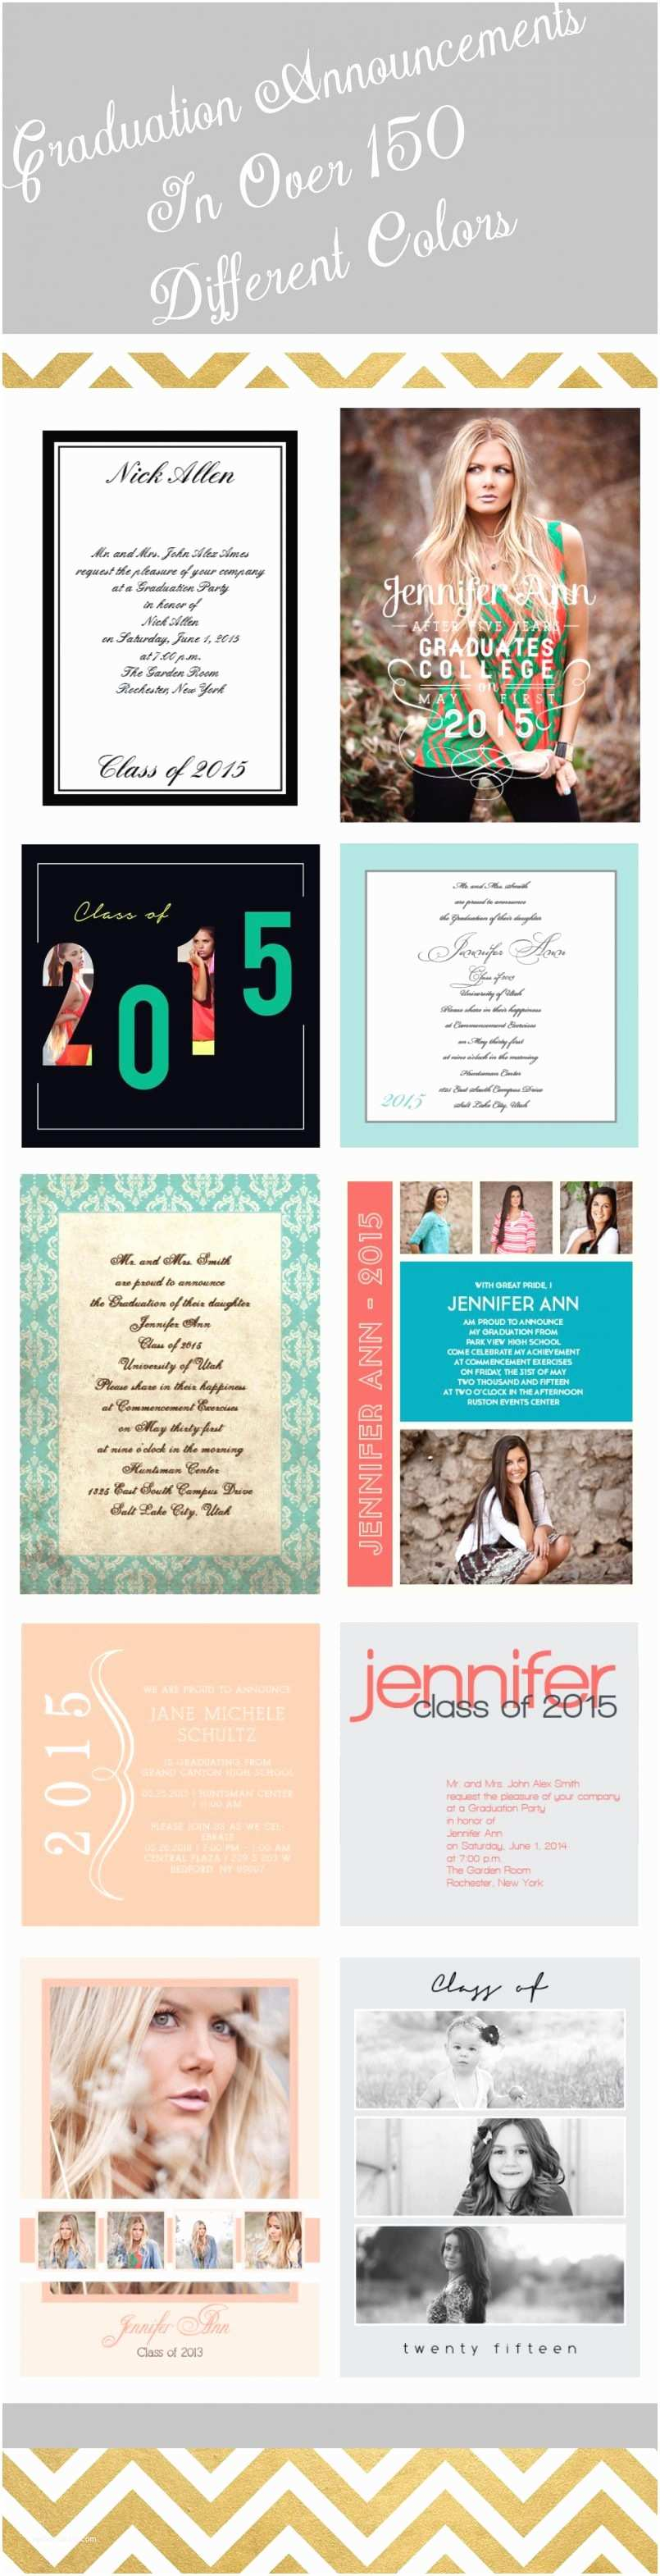 Make Your Own Graduation Invitations Designs Design Your Own Graduation Invitations Li and